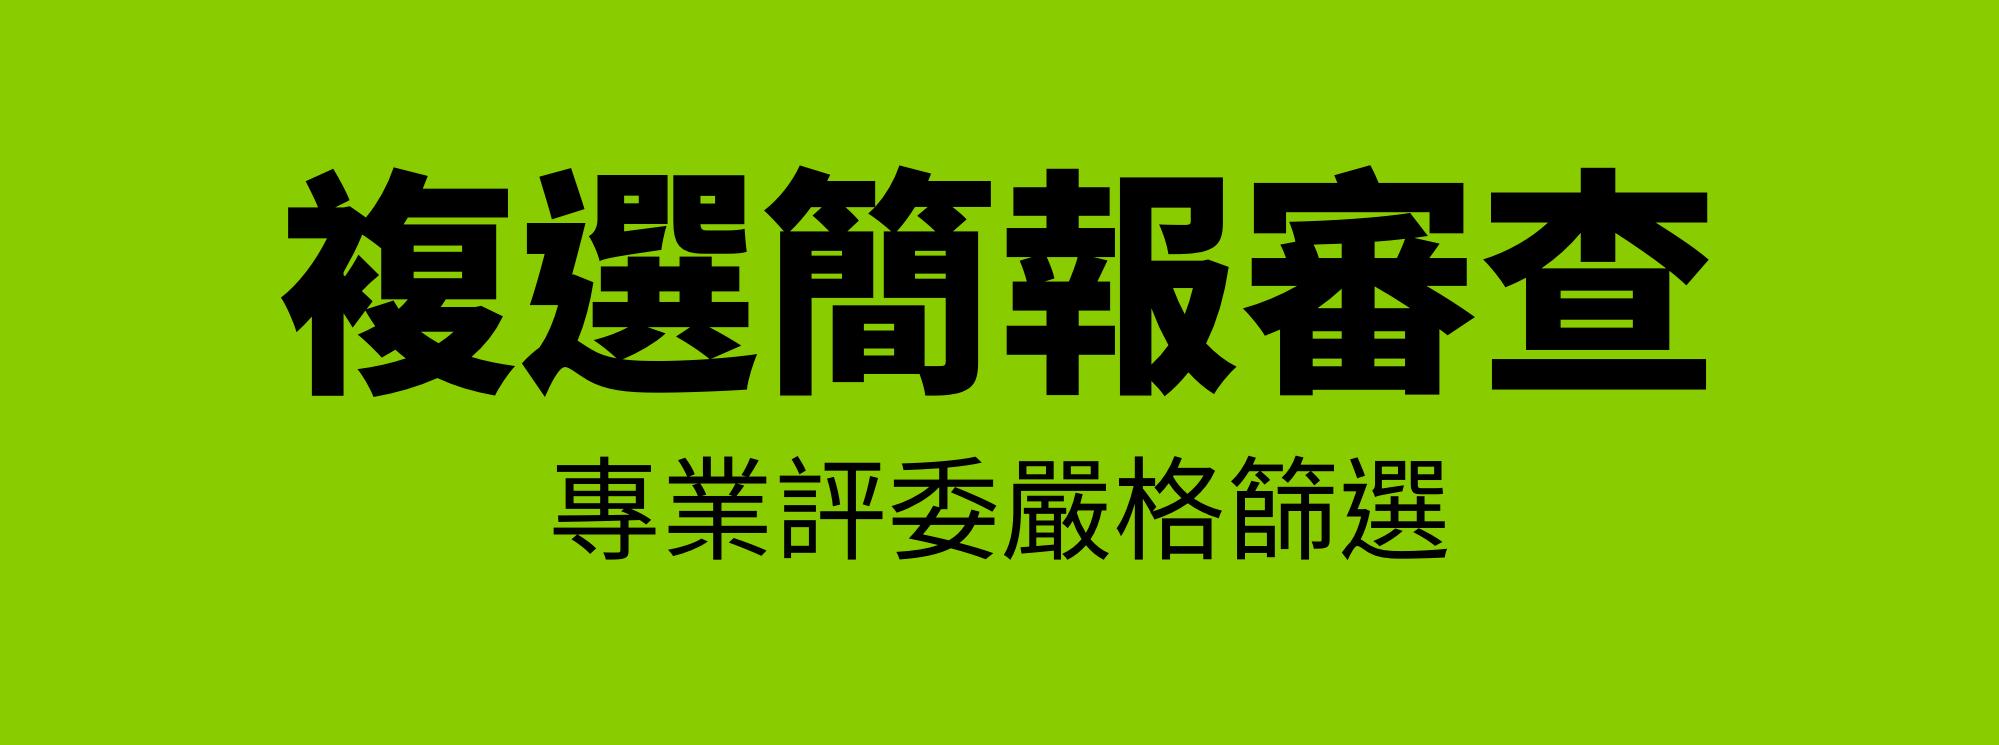 May.05 l 複選簡報審查